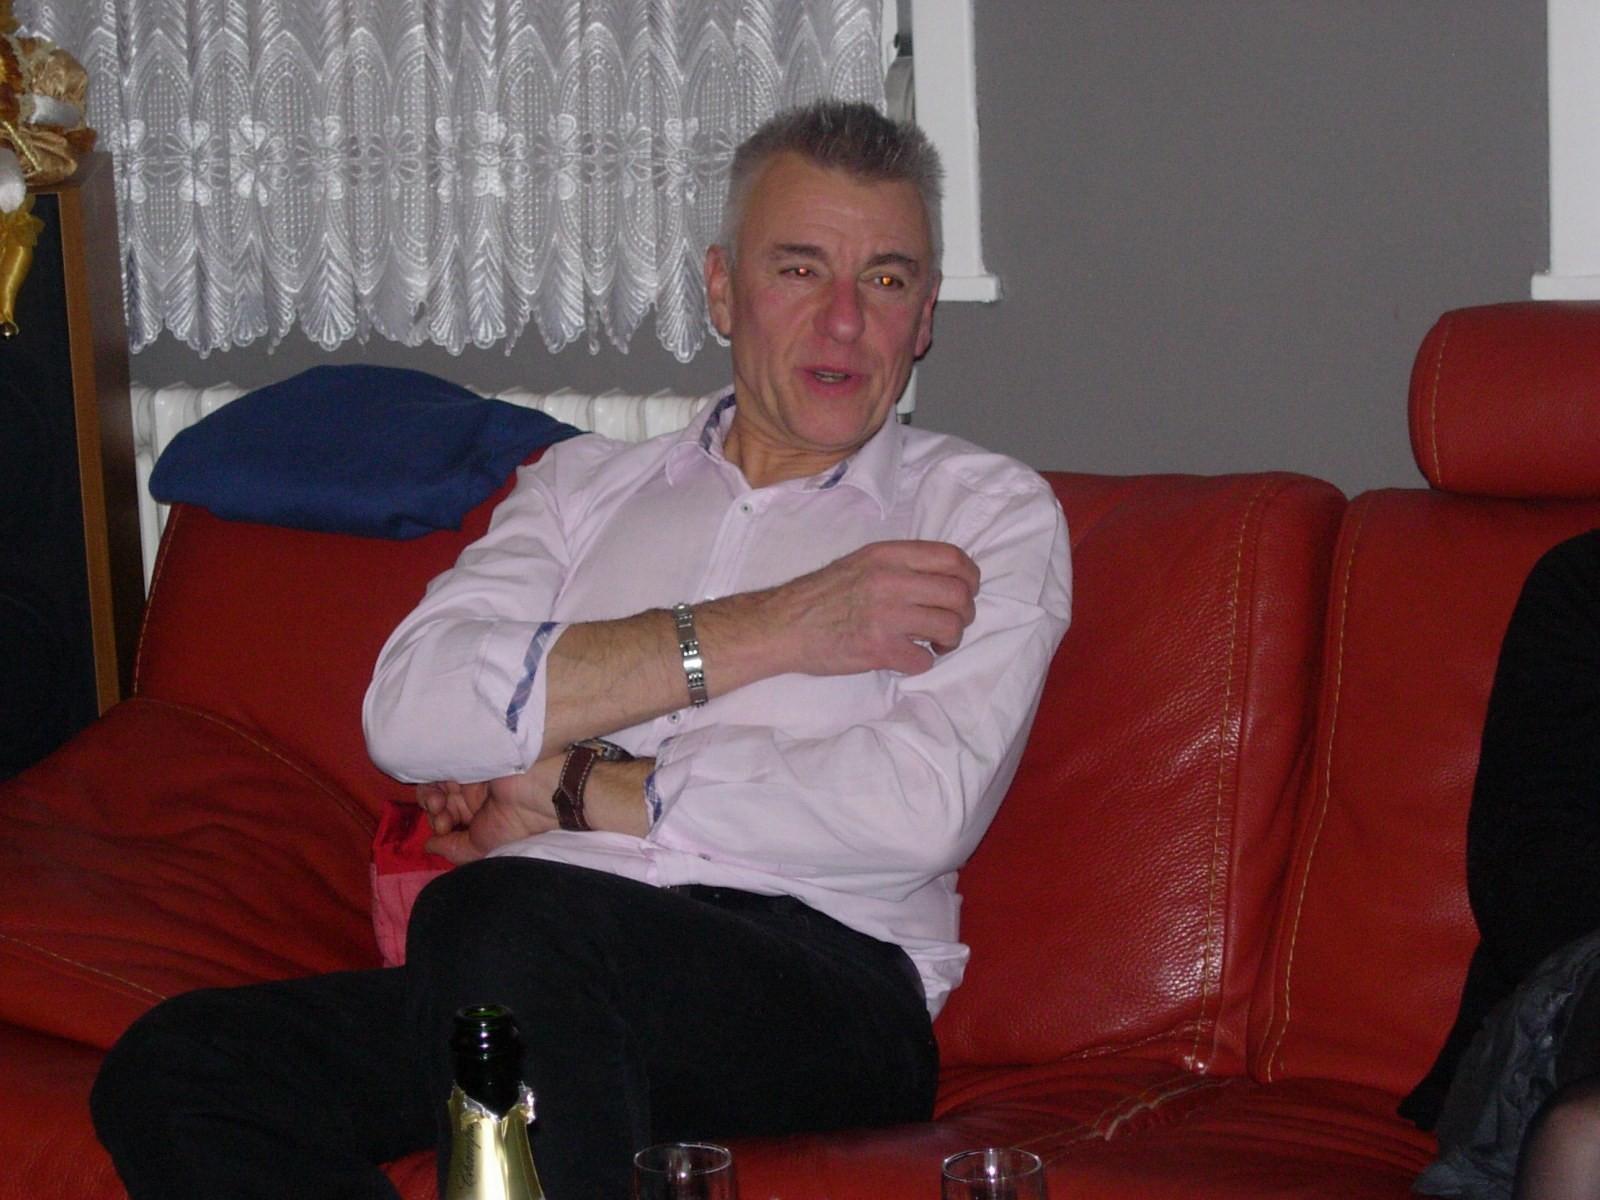 JEAN LUC BRILLOUET